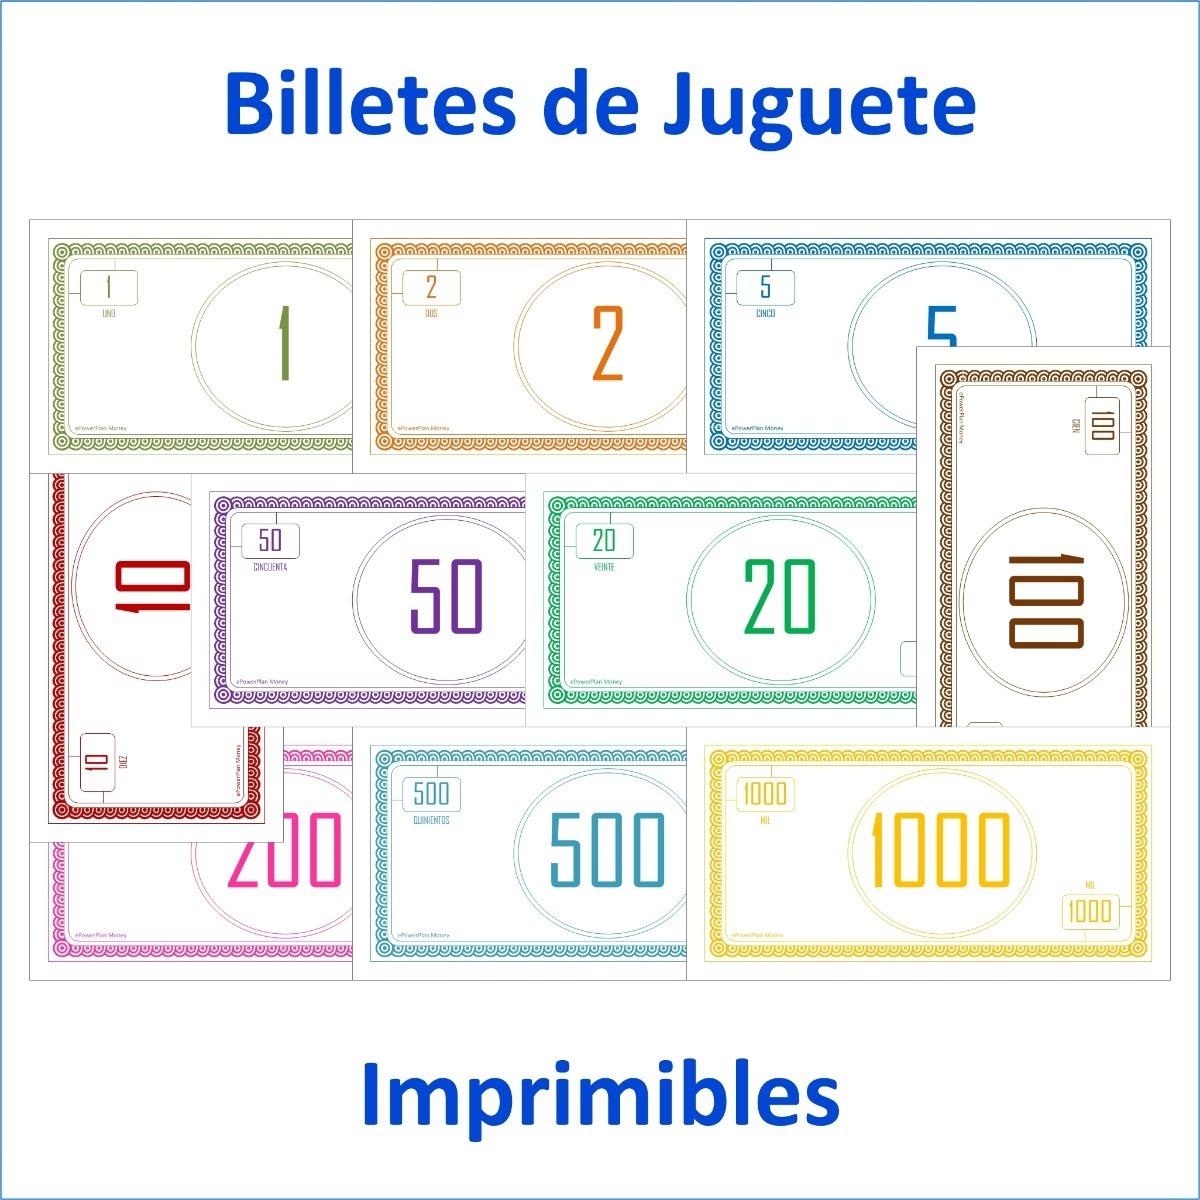 De Para Imprimir Billetes Juguete Pdf 7Yb6gyvf